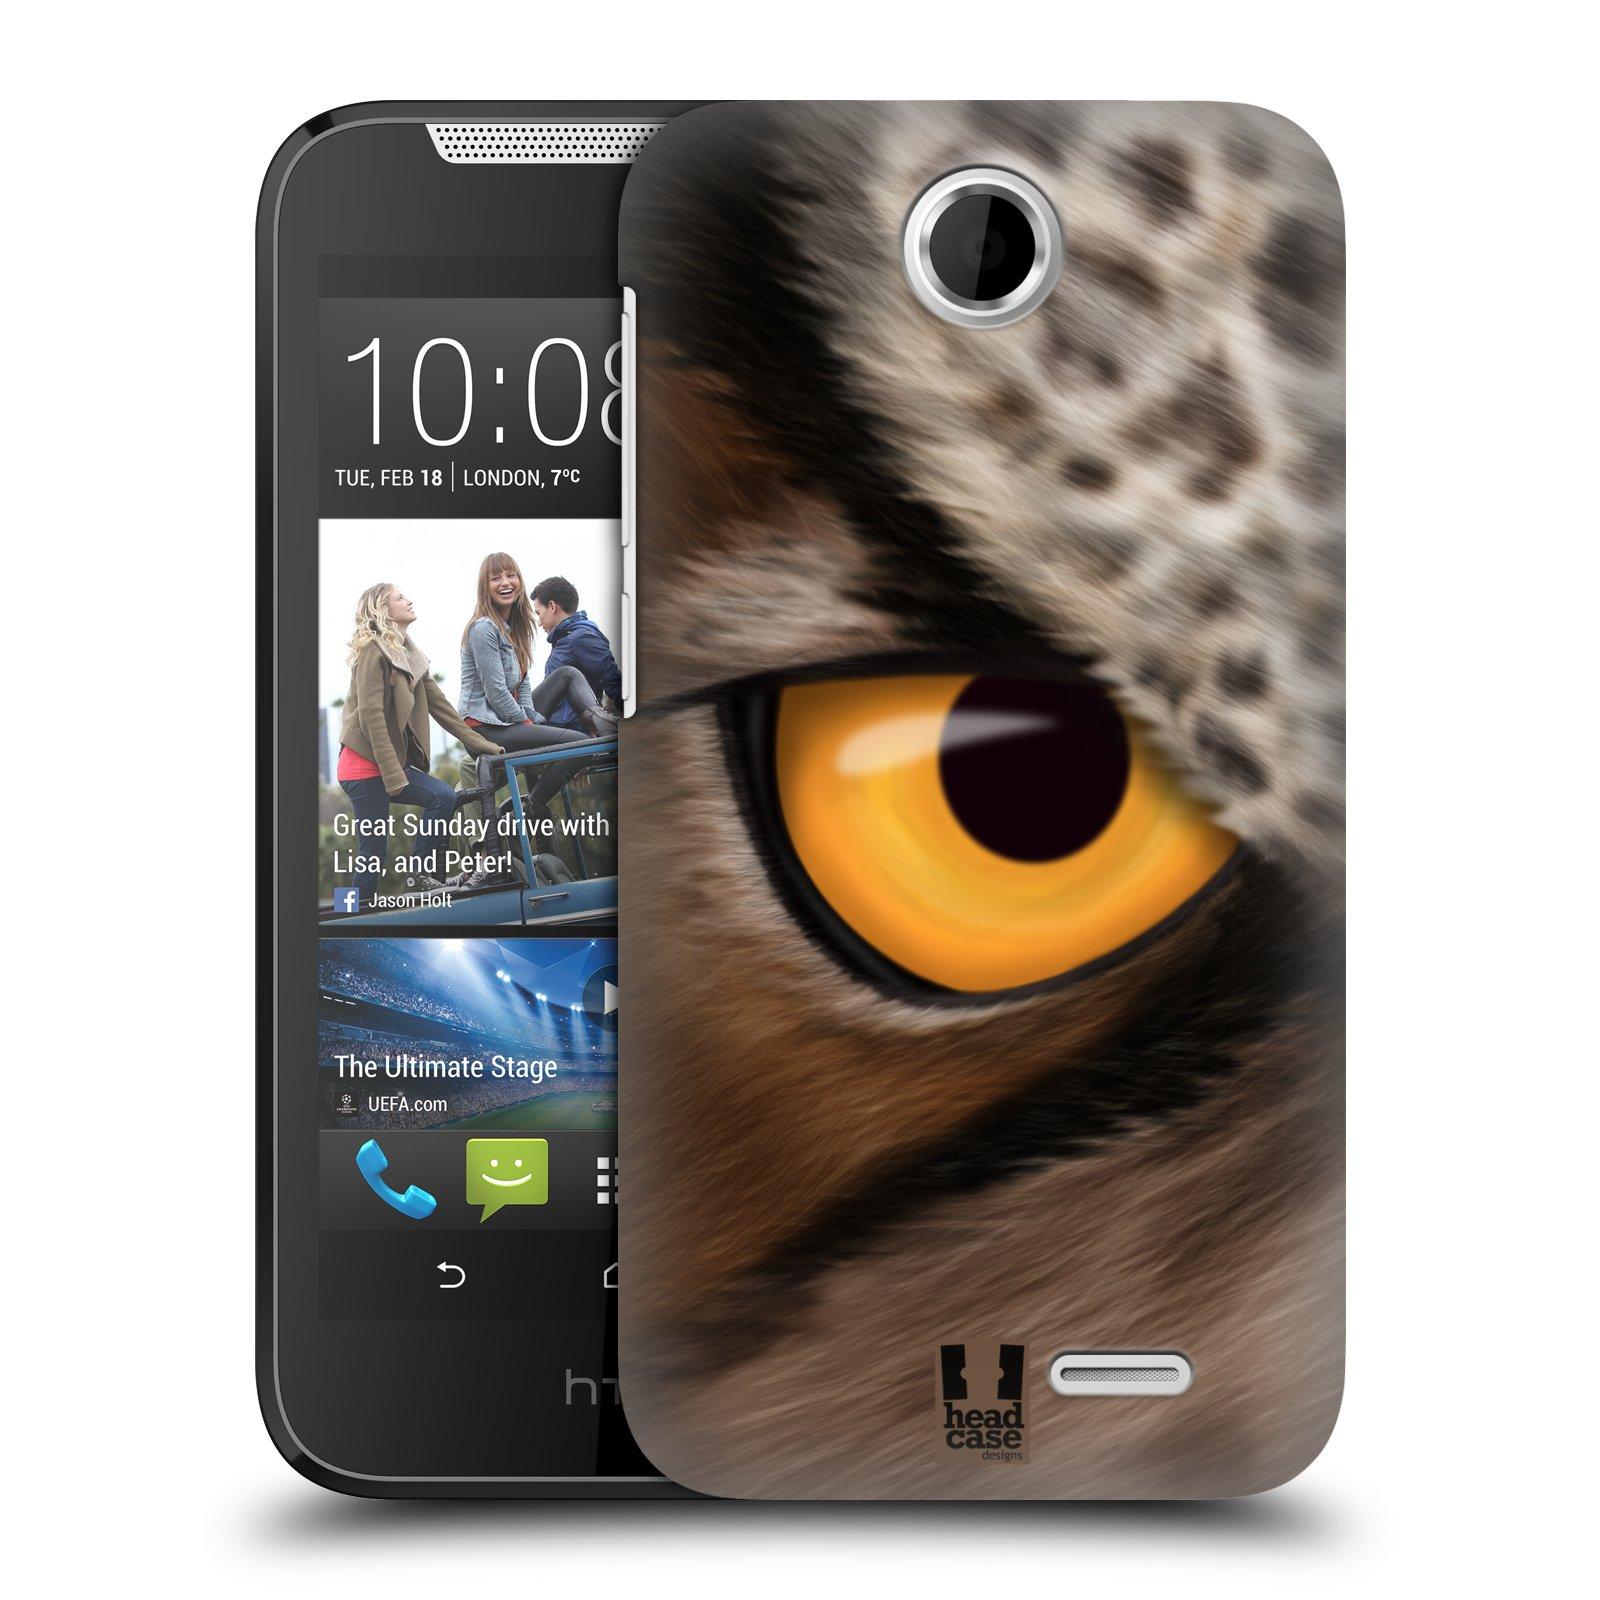 HEAD CASE plastový obal na mobil HTC Desire 310 vzor pohled zvířete oko sova